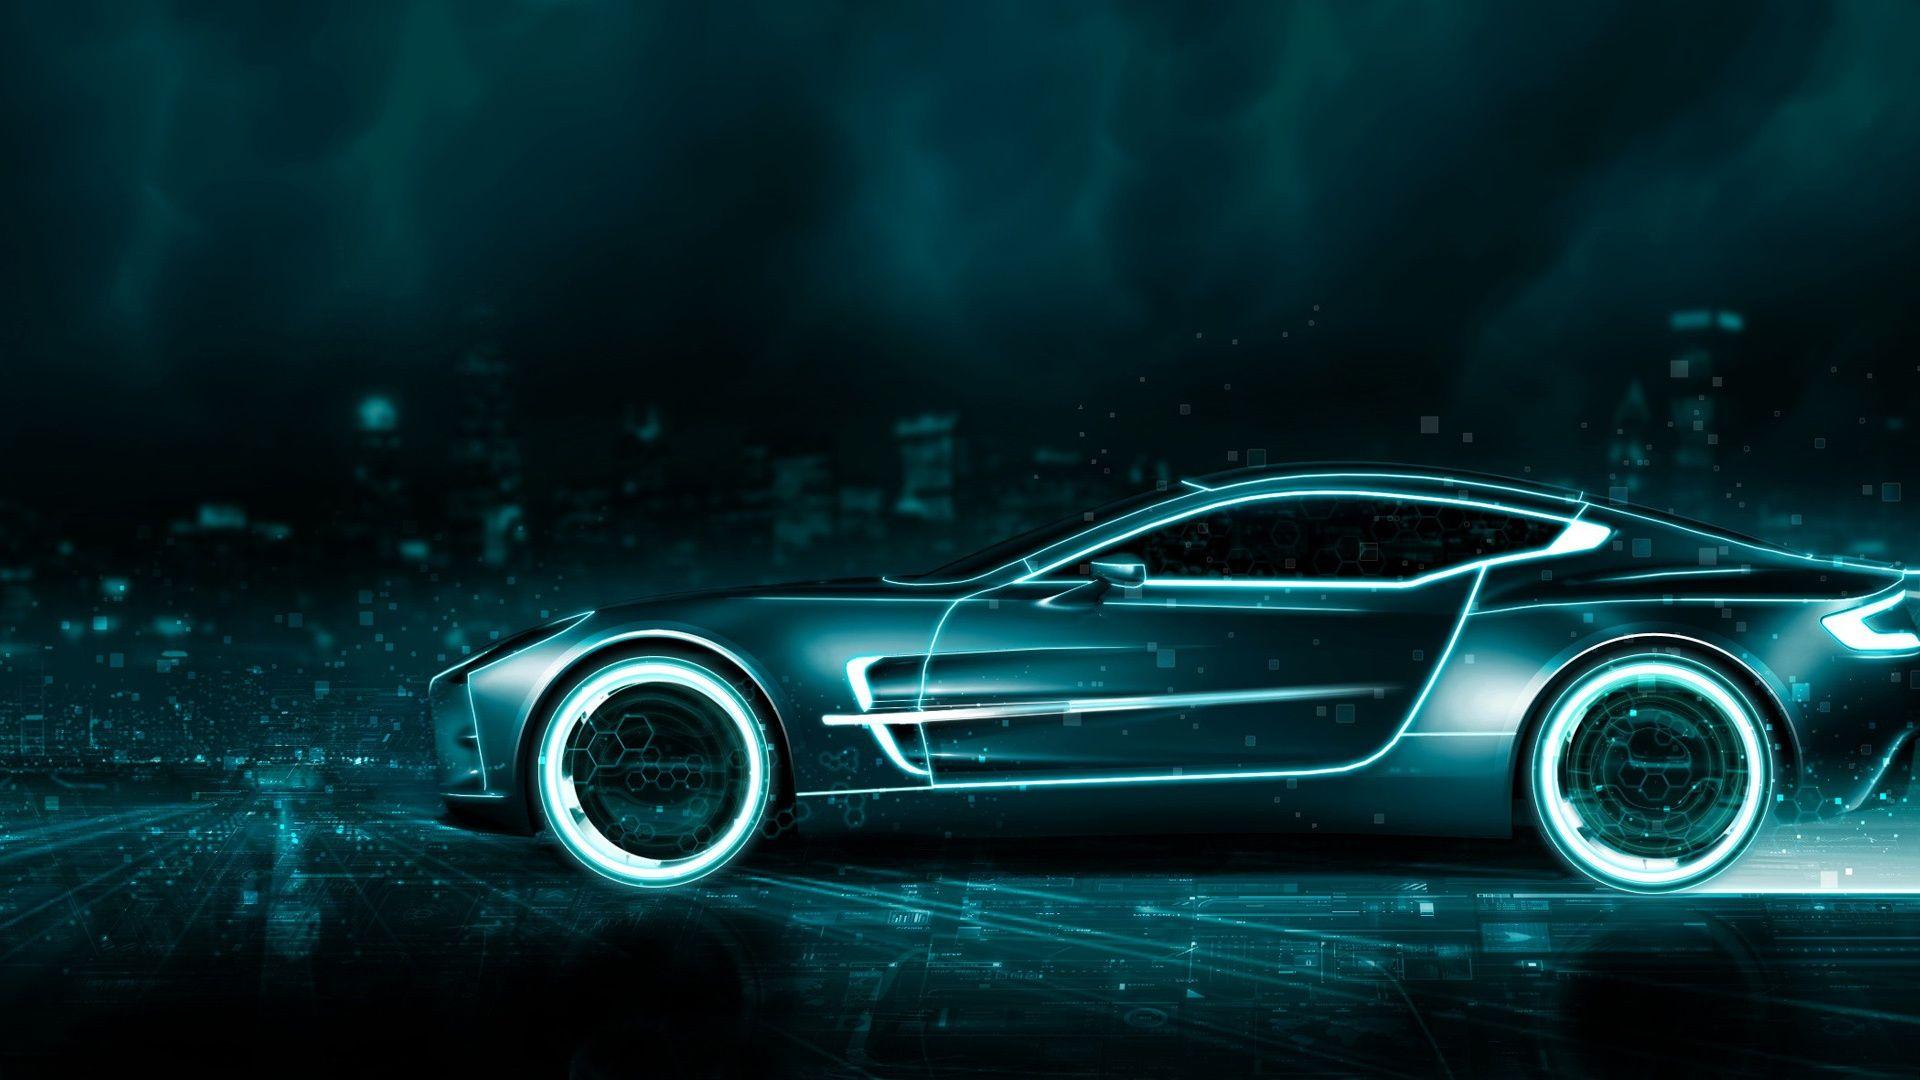 Tron Legacy Cars, Car